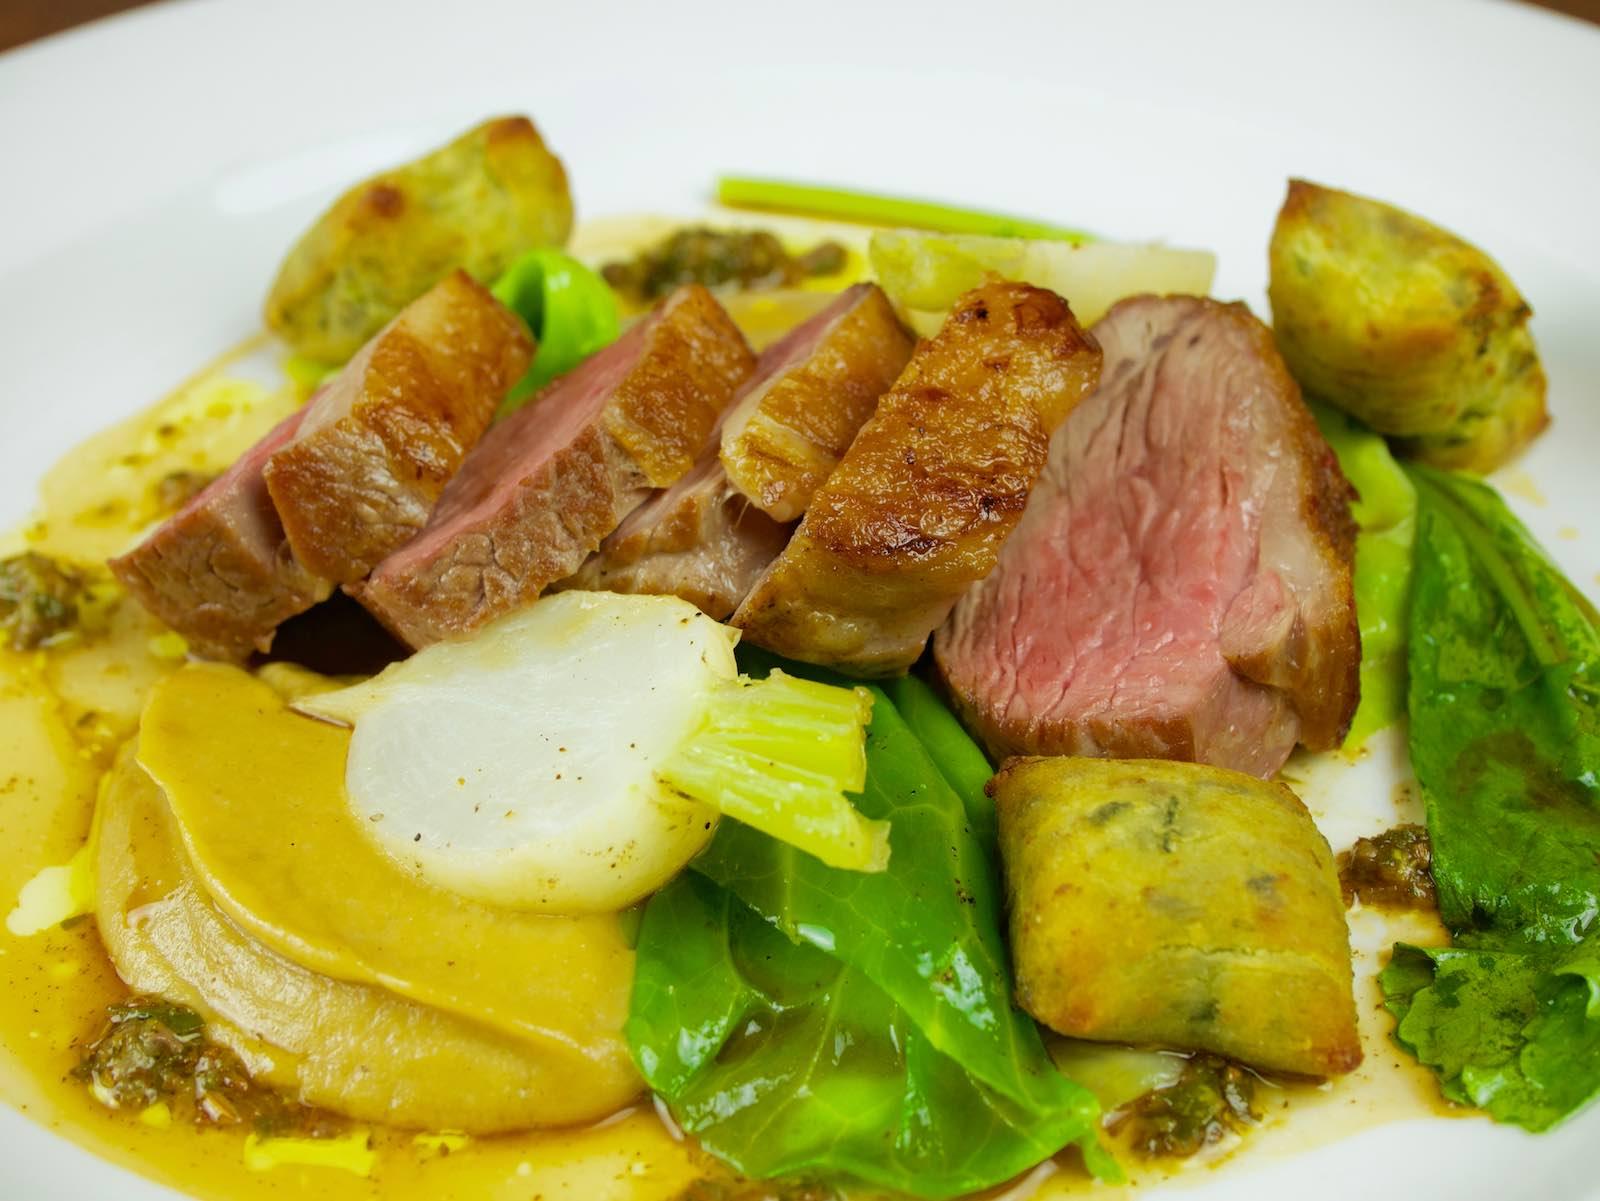 New-season-spring-lamb-chump-onion-puree-hispi-cabbage-wild-garlic-gnocchi-anchovy-marjoram-and-Ramsbury-virgin-rapeseed-oil-dressing-web-page